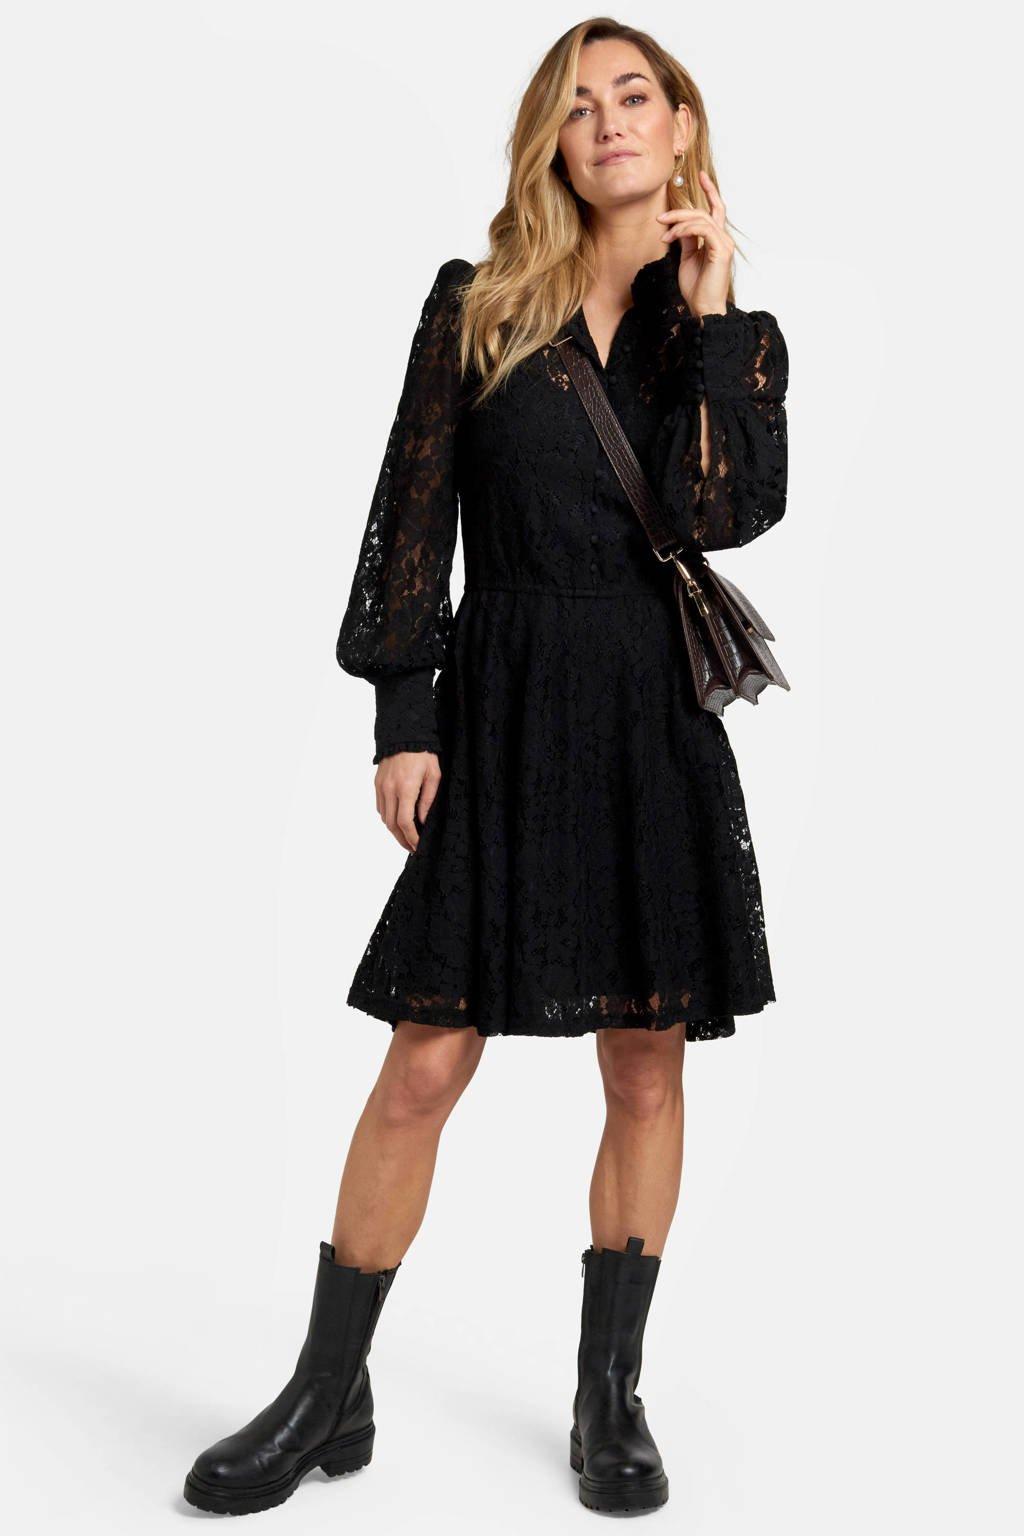 Eksept by Shoeby blousejurk met kant zwart, Zwart